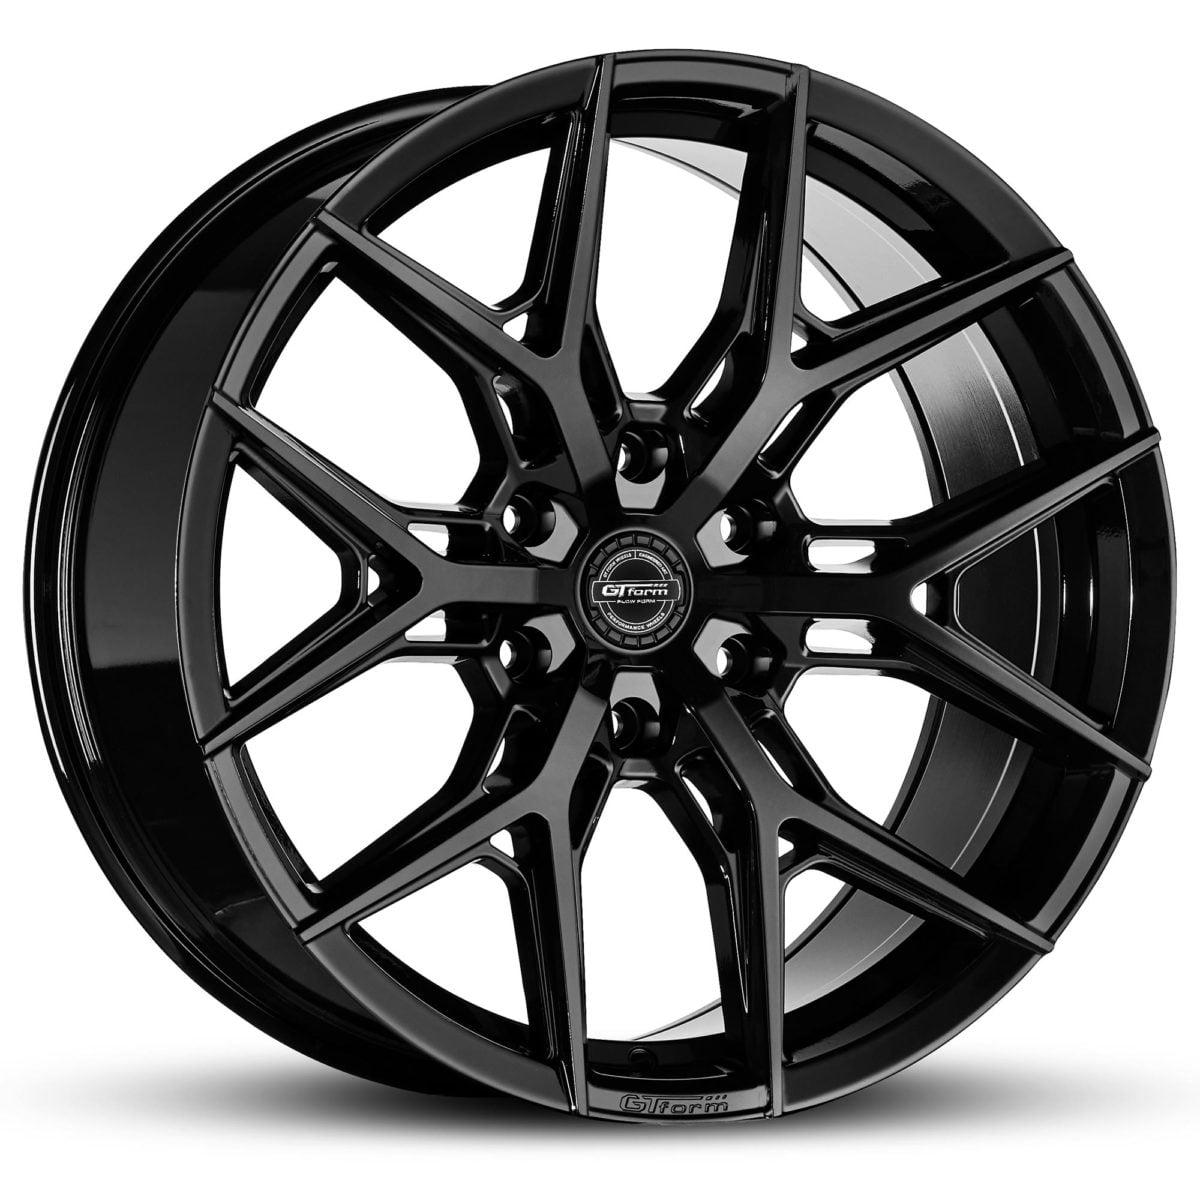 4x4 Rims GT Form GF-S1 Gloss Black 18x9 Wheels 6x139.7 rims